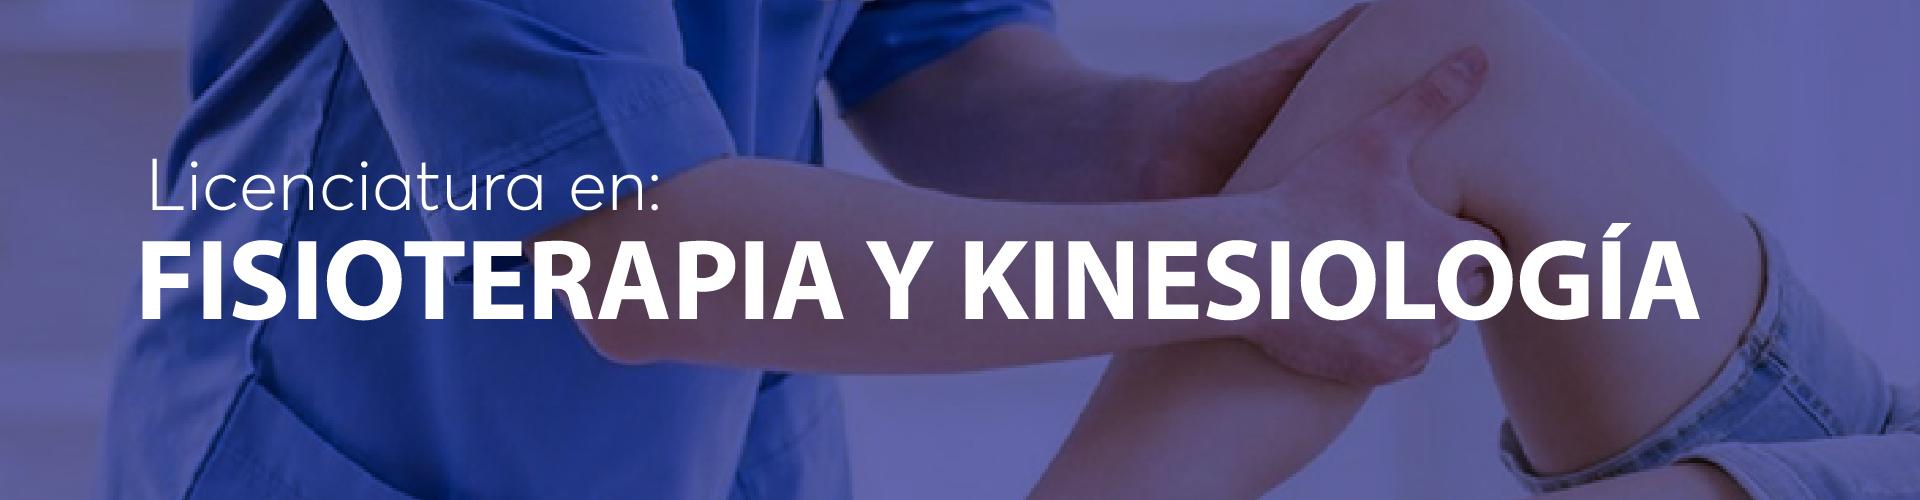 Fisioterapia y kinesiologia